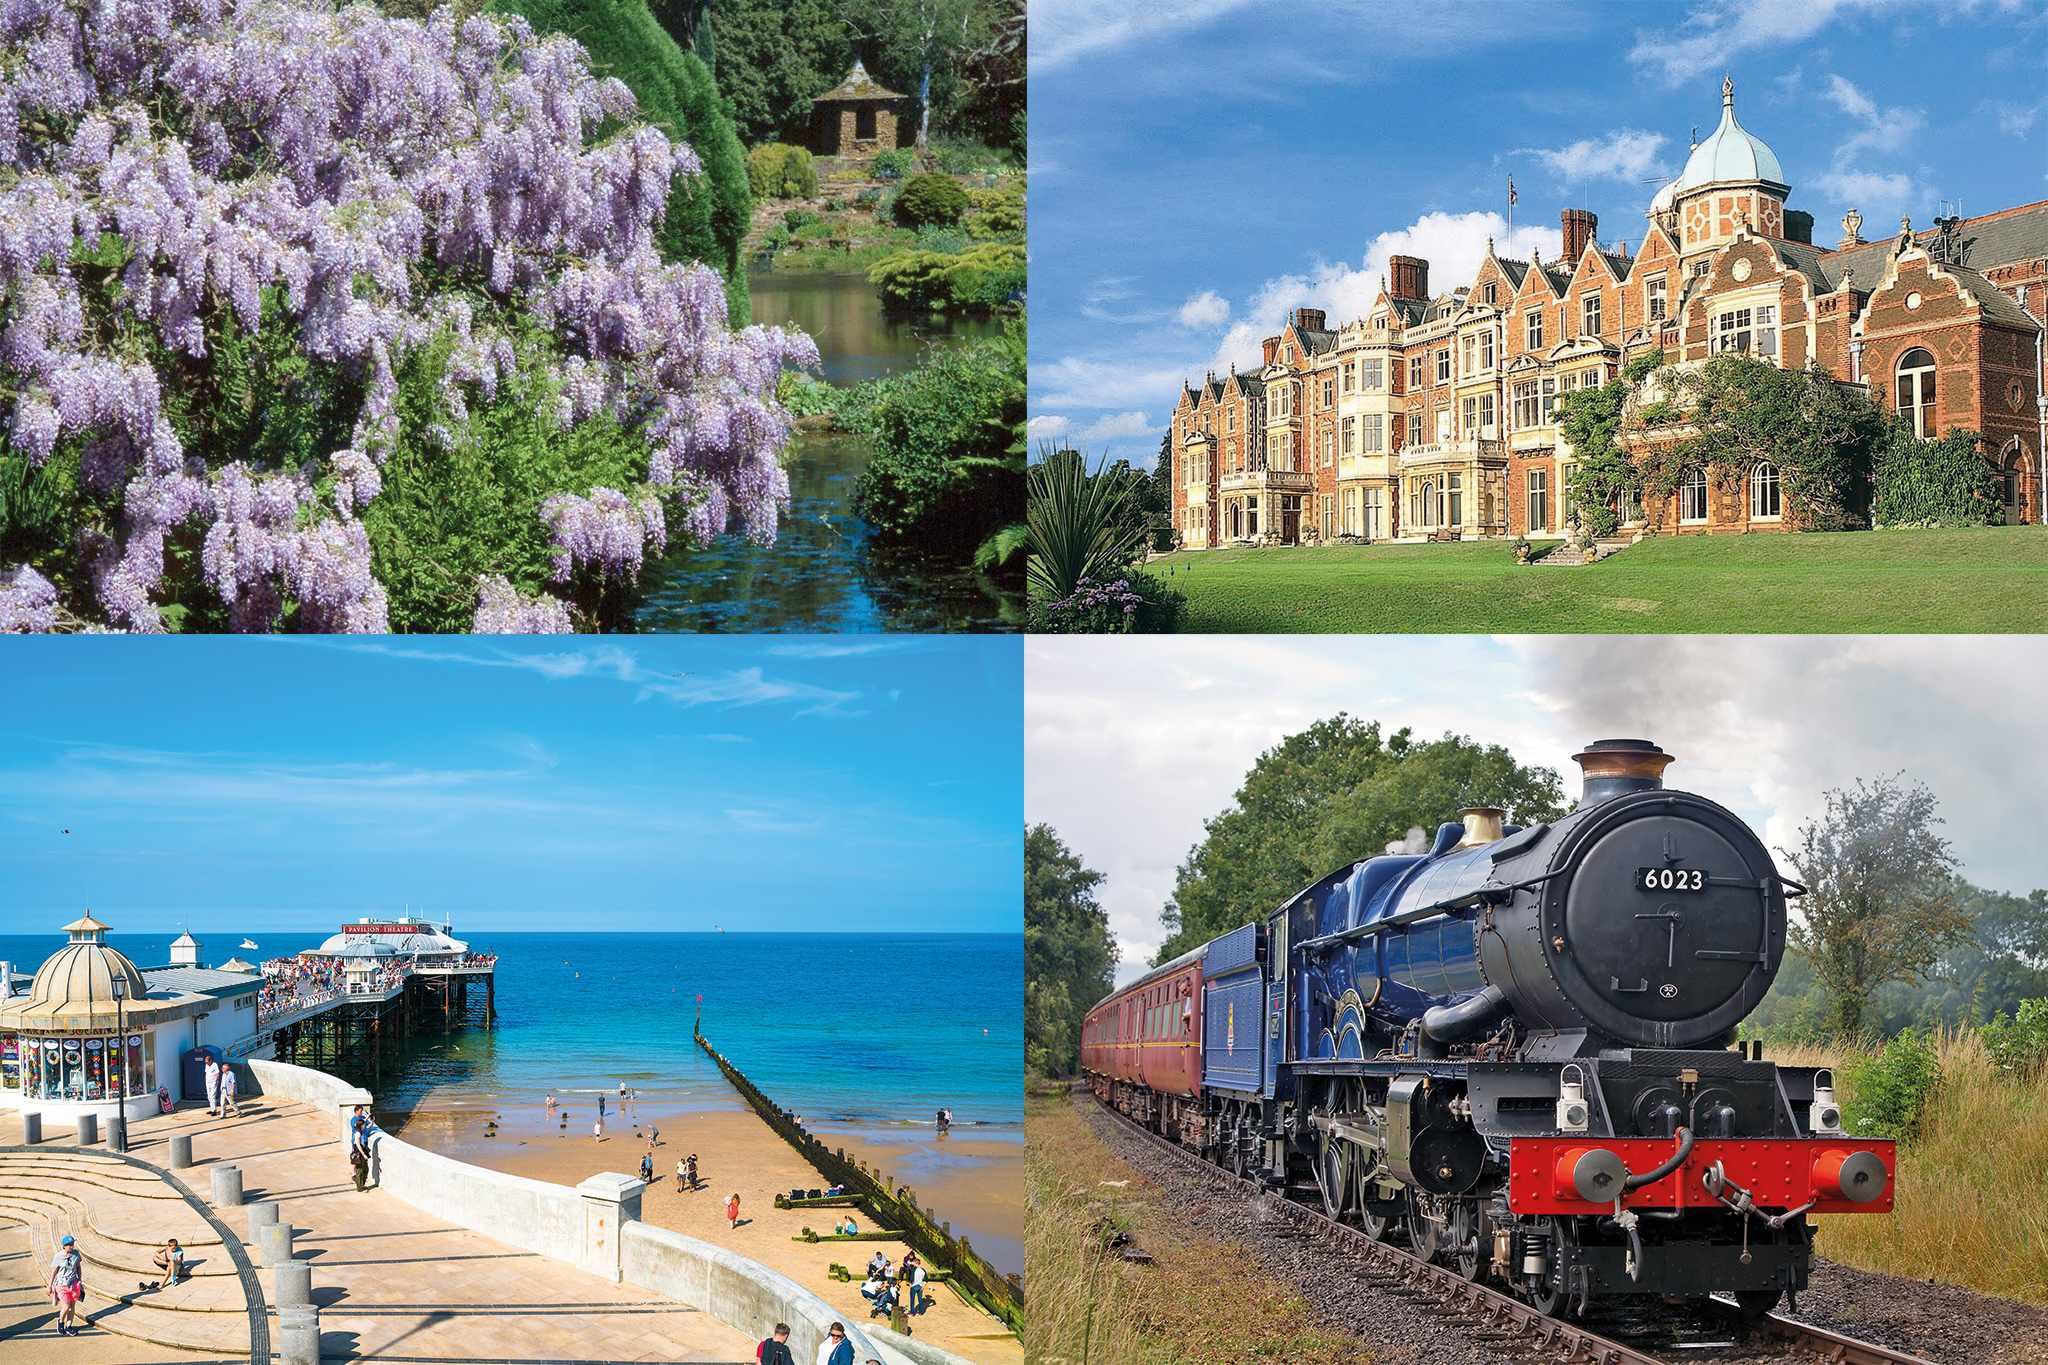 arena-rail-holidays-sandringham-norfolk-railway-2048-1365